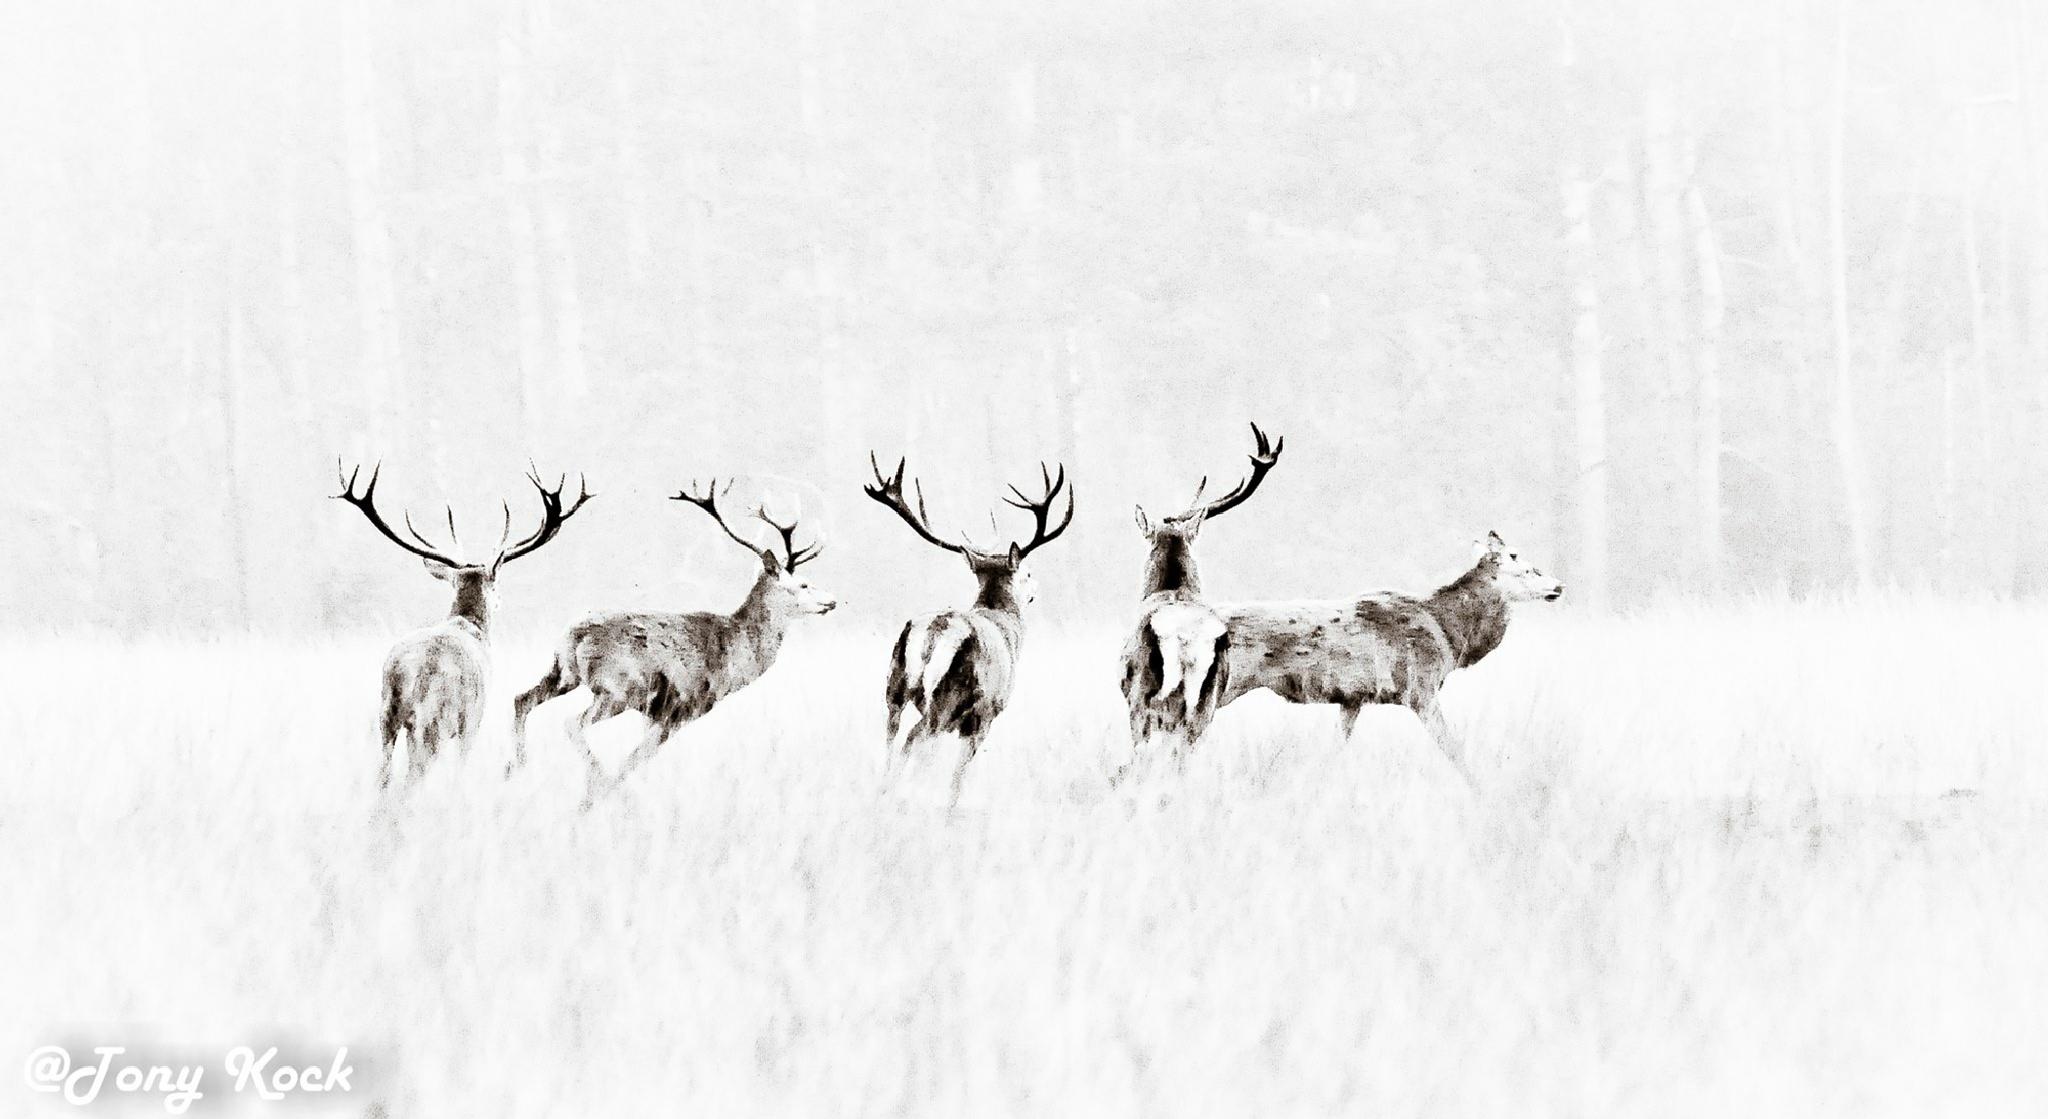 Untitled by Antonia kock